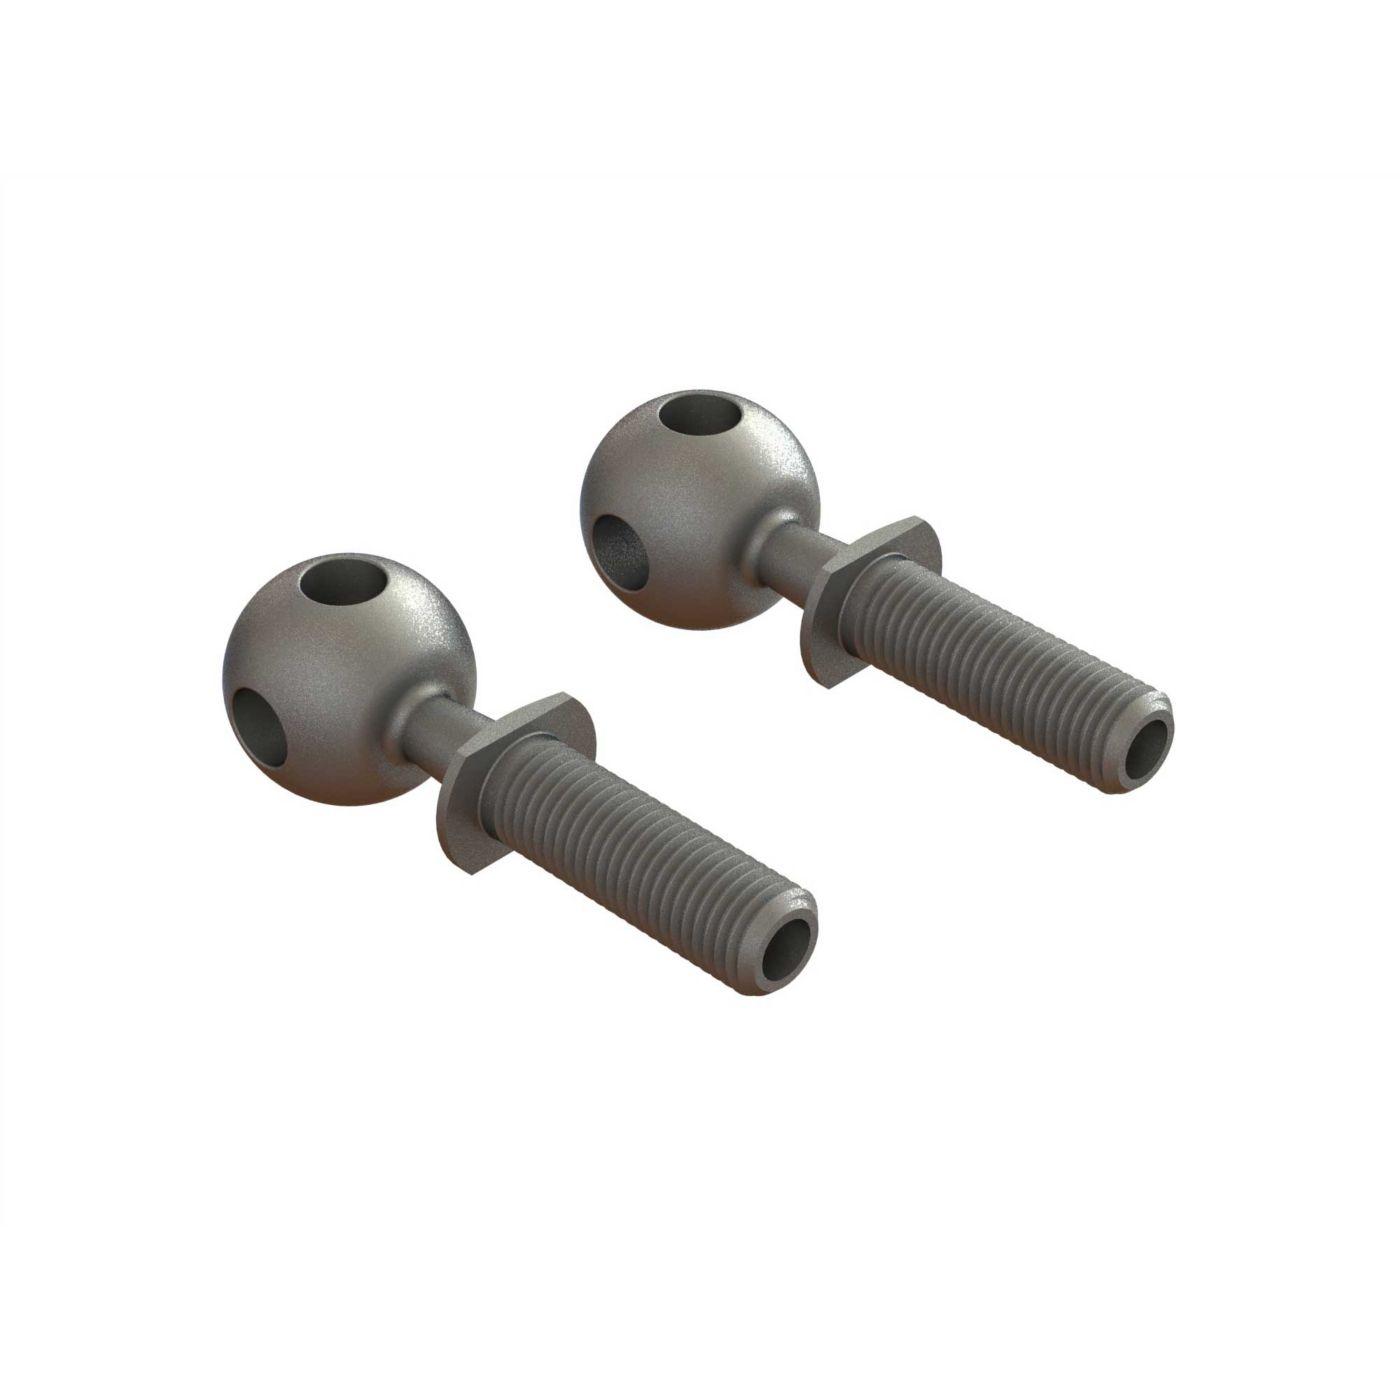 18mm Pivot Ball M8x25mm (2)